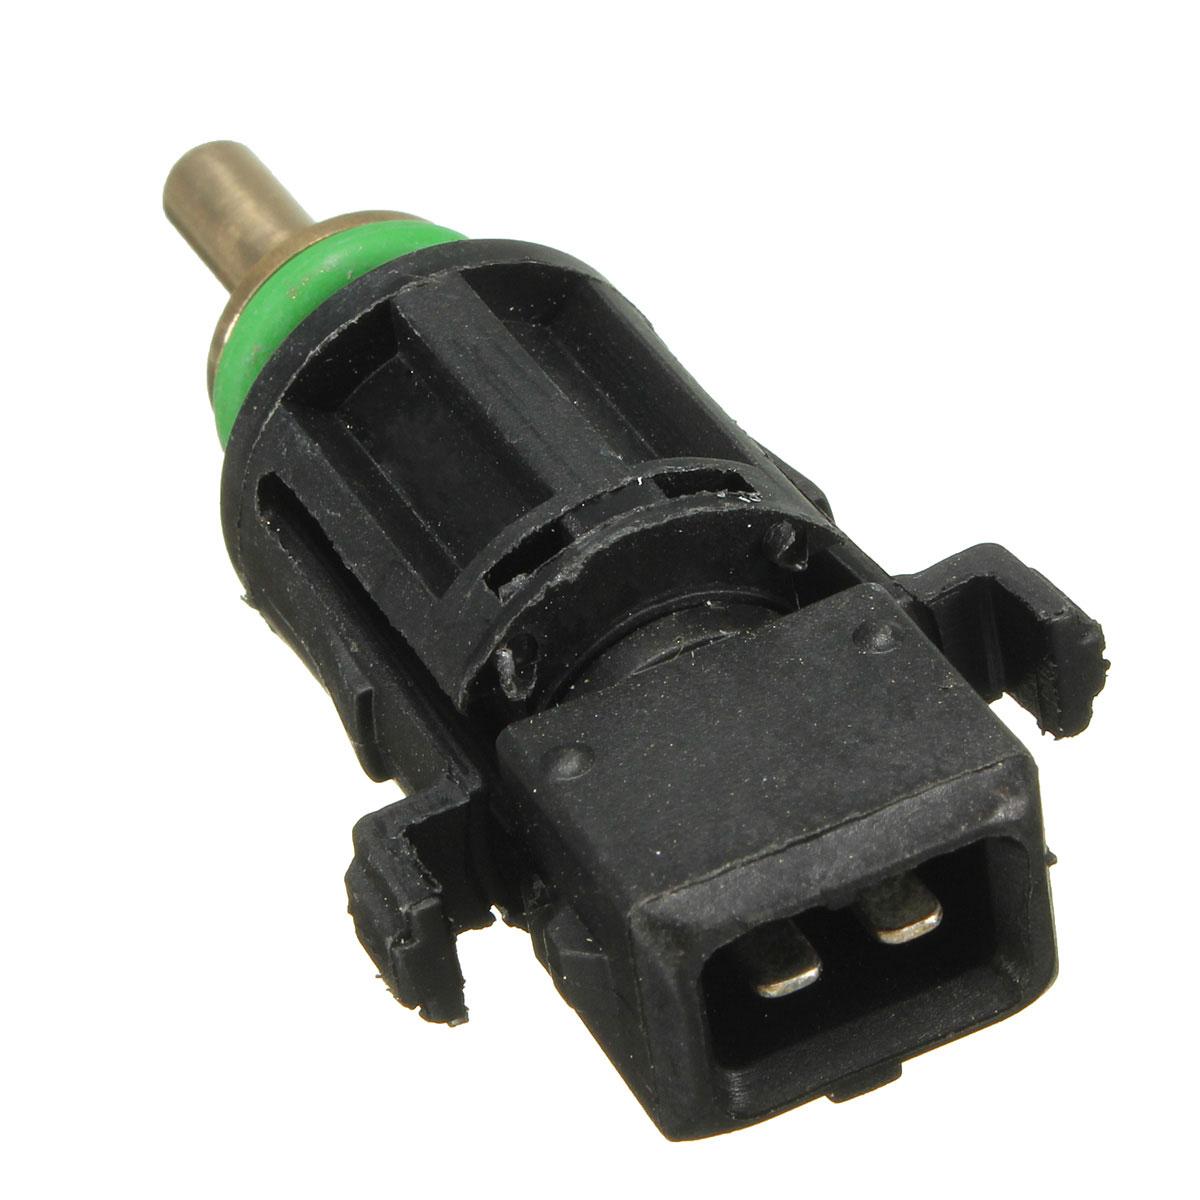 Coolant hose Temperature Sensor BMW E46 E92 E90 E39 E53 X5 X6 X3 E81 E87 F30 F10